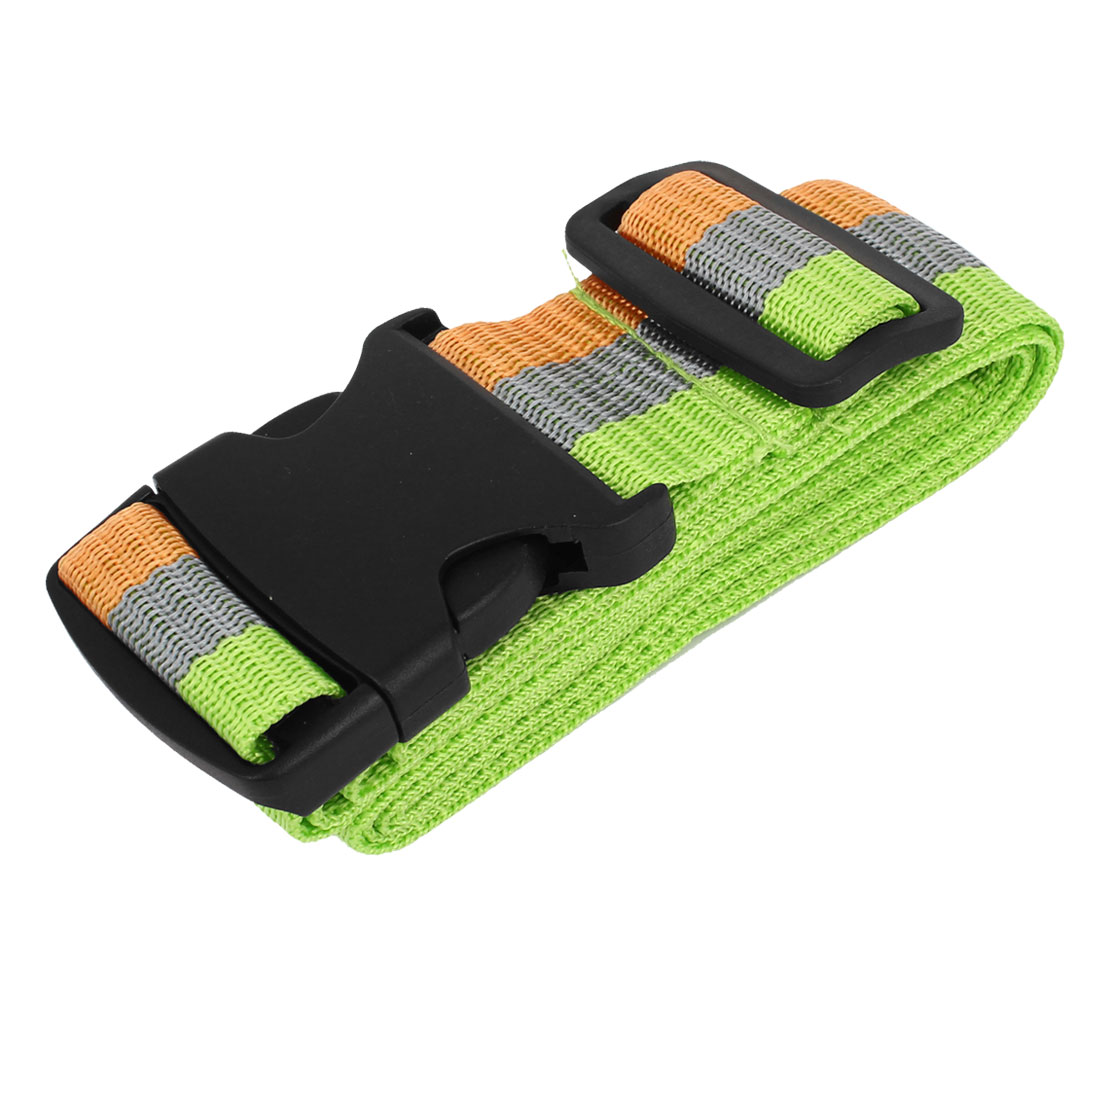 "Outdoor Travel Release Buckle Adjustable Stripe Pattern Package Packing Belt Strape 1.9"" Width"